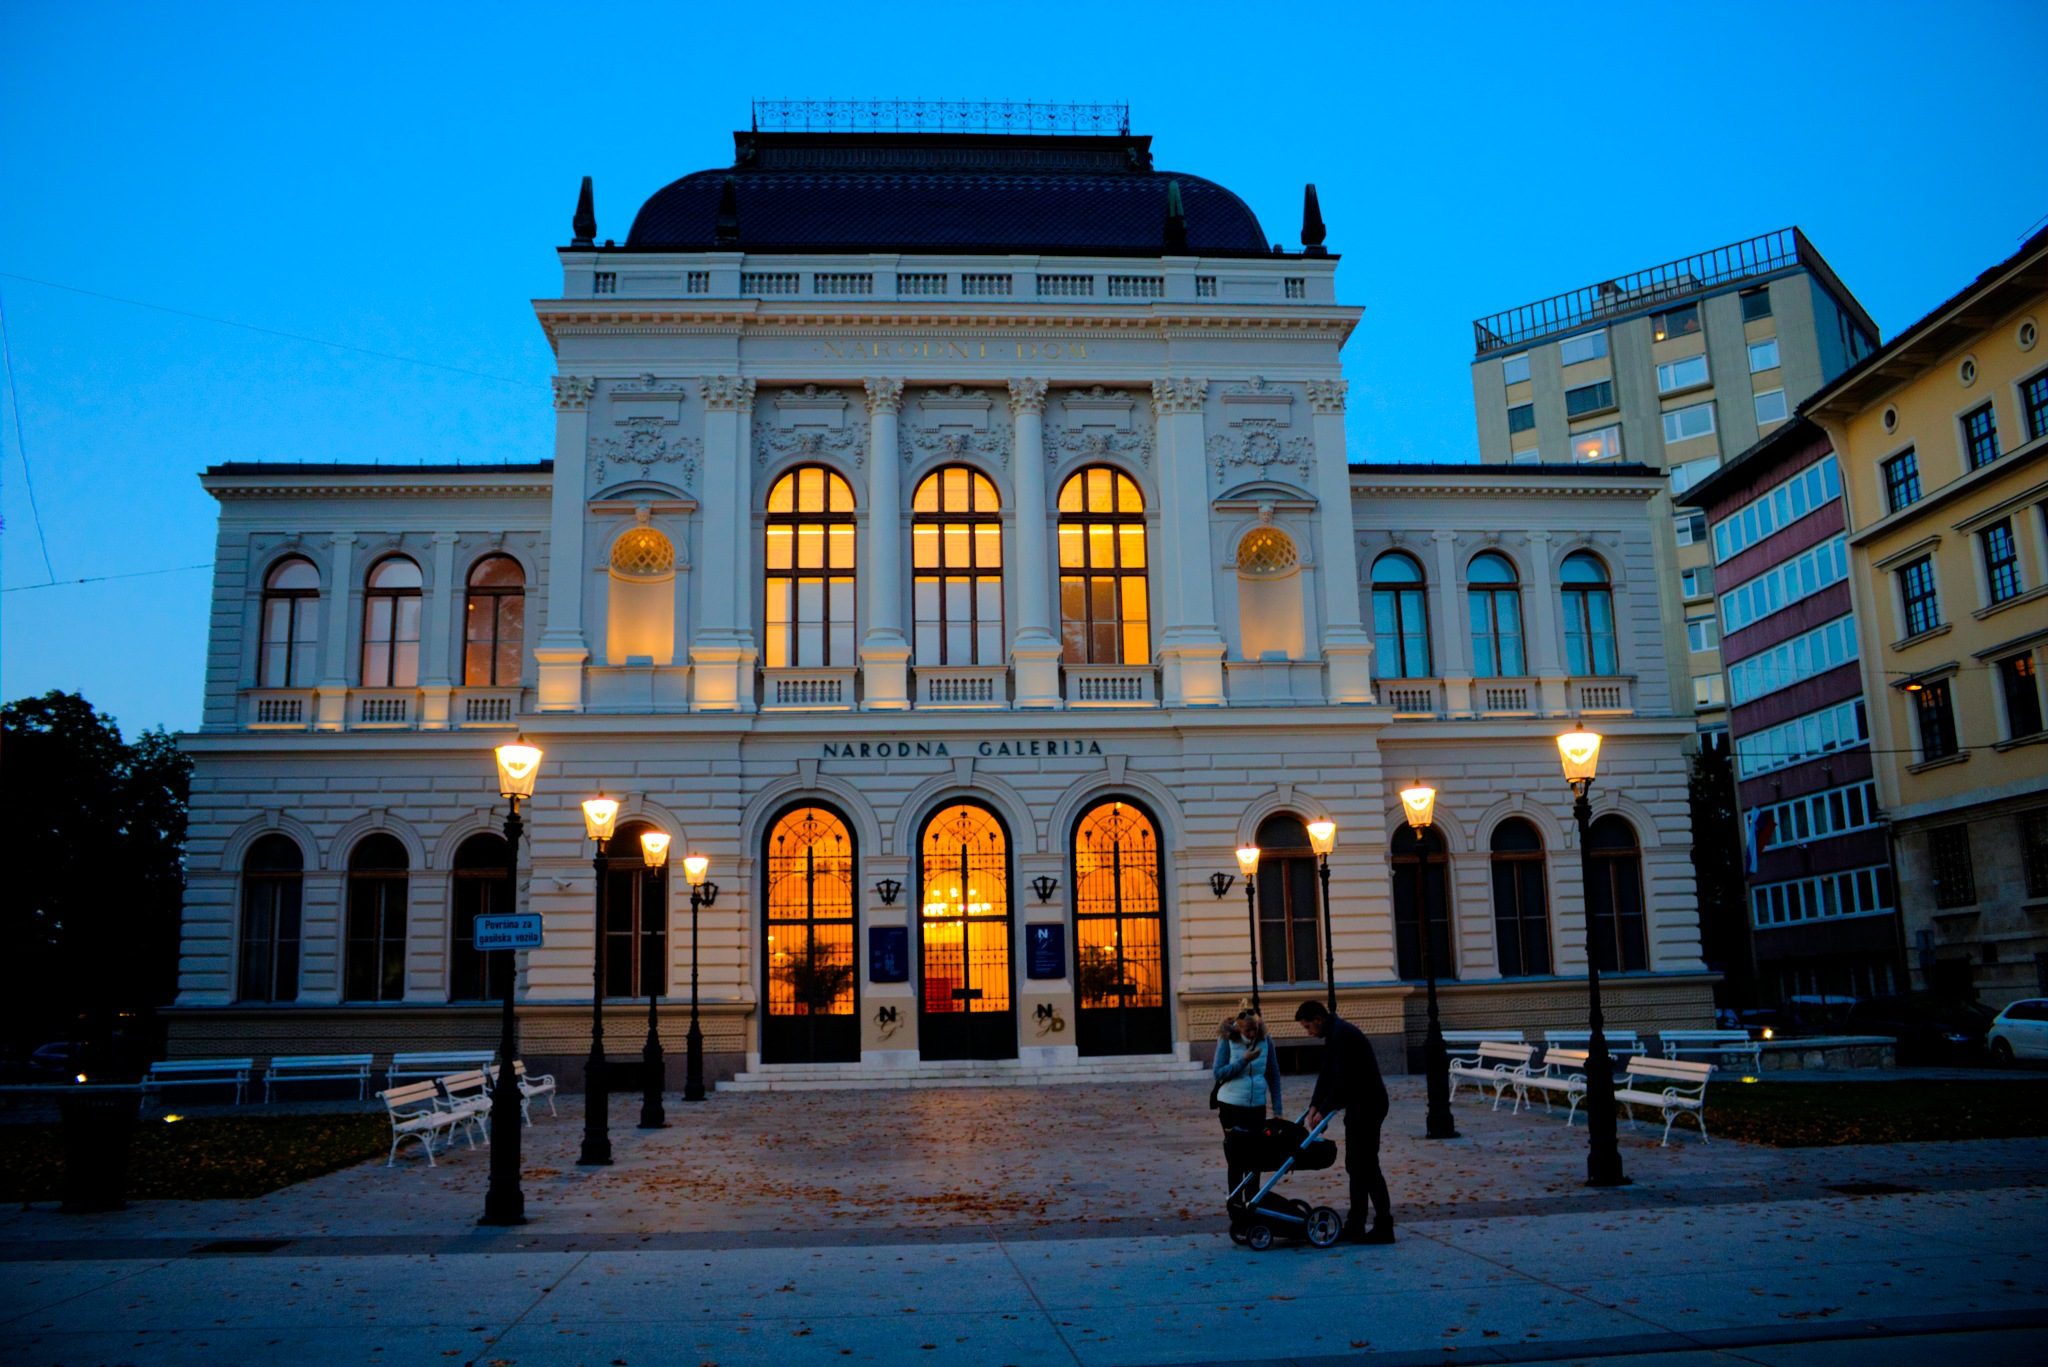 National gallery , Ljubljana (CR2) by zvnktomasevic